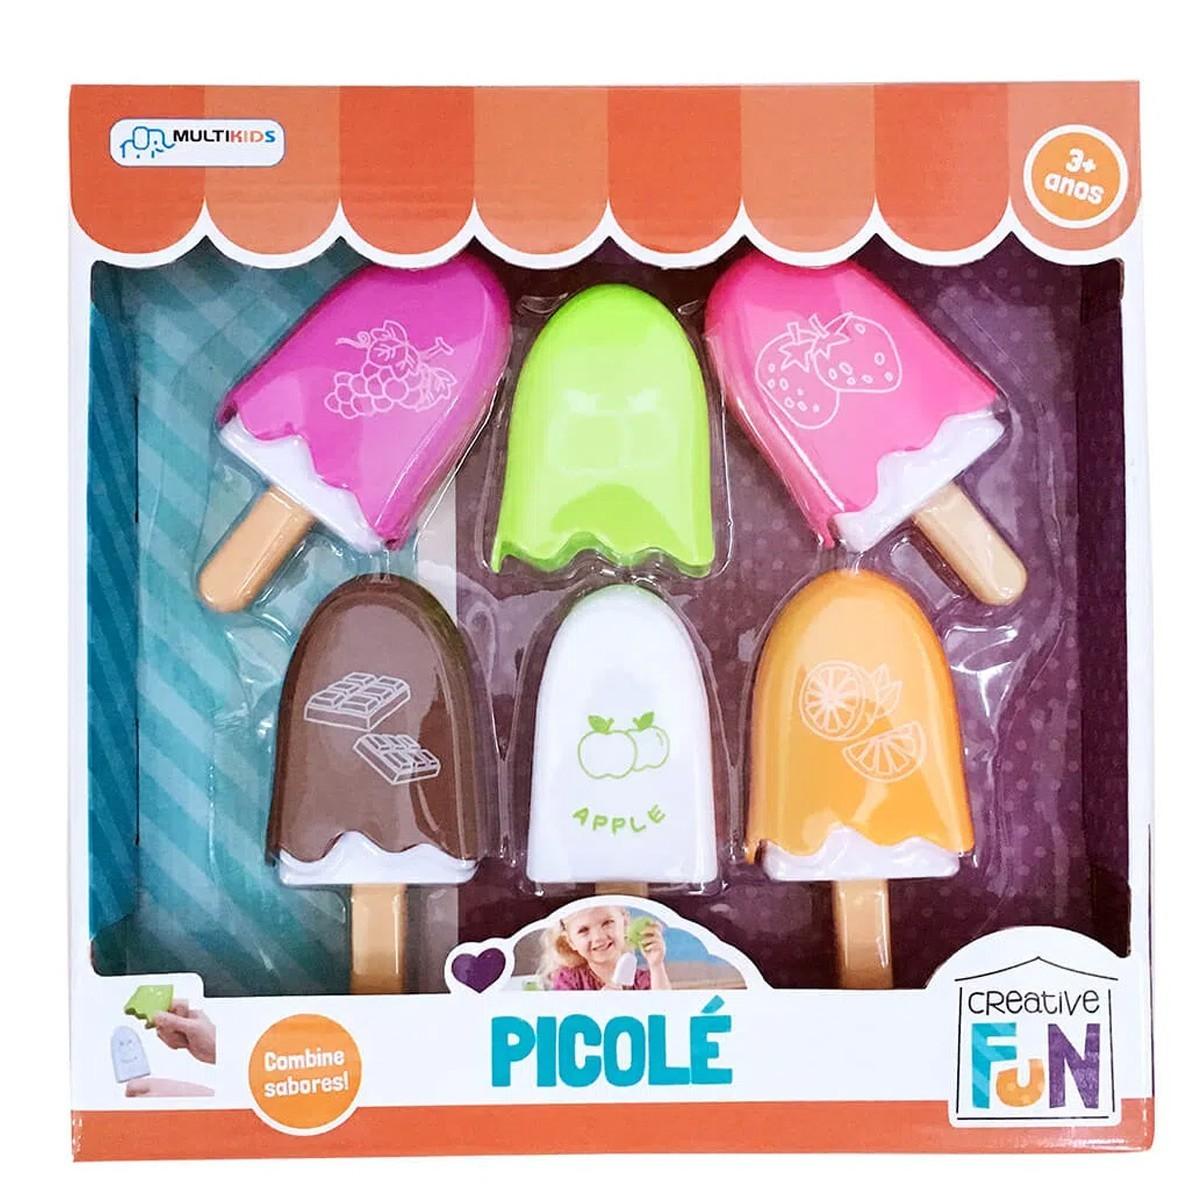 Brinquedo Creative Fun Picolé Multikids Br644